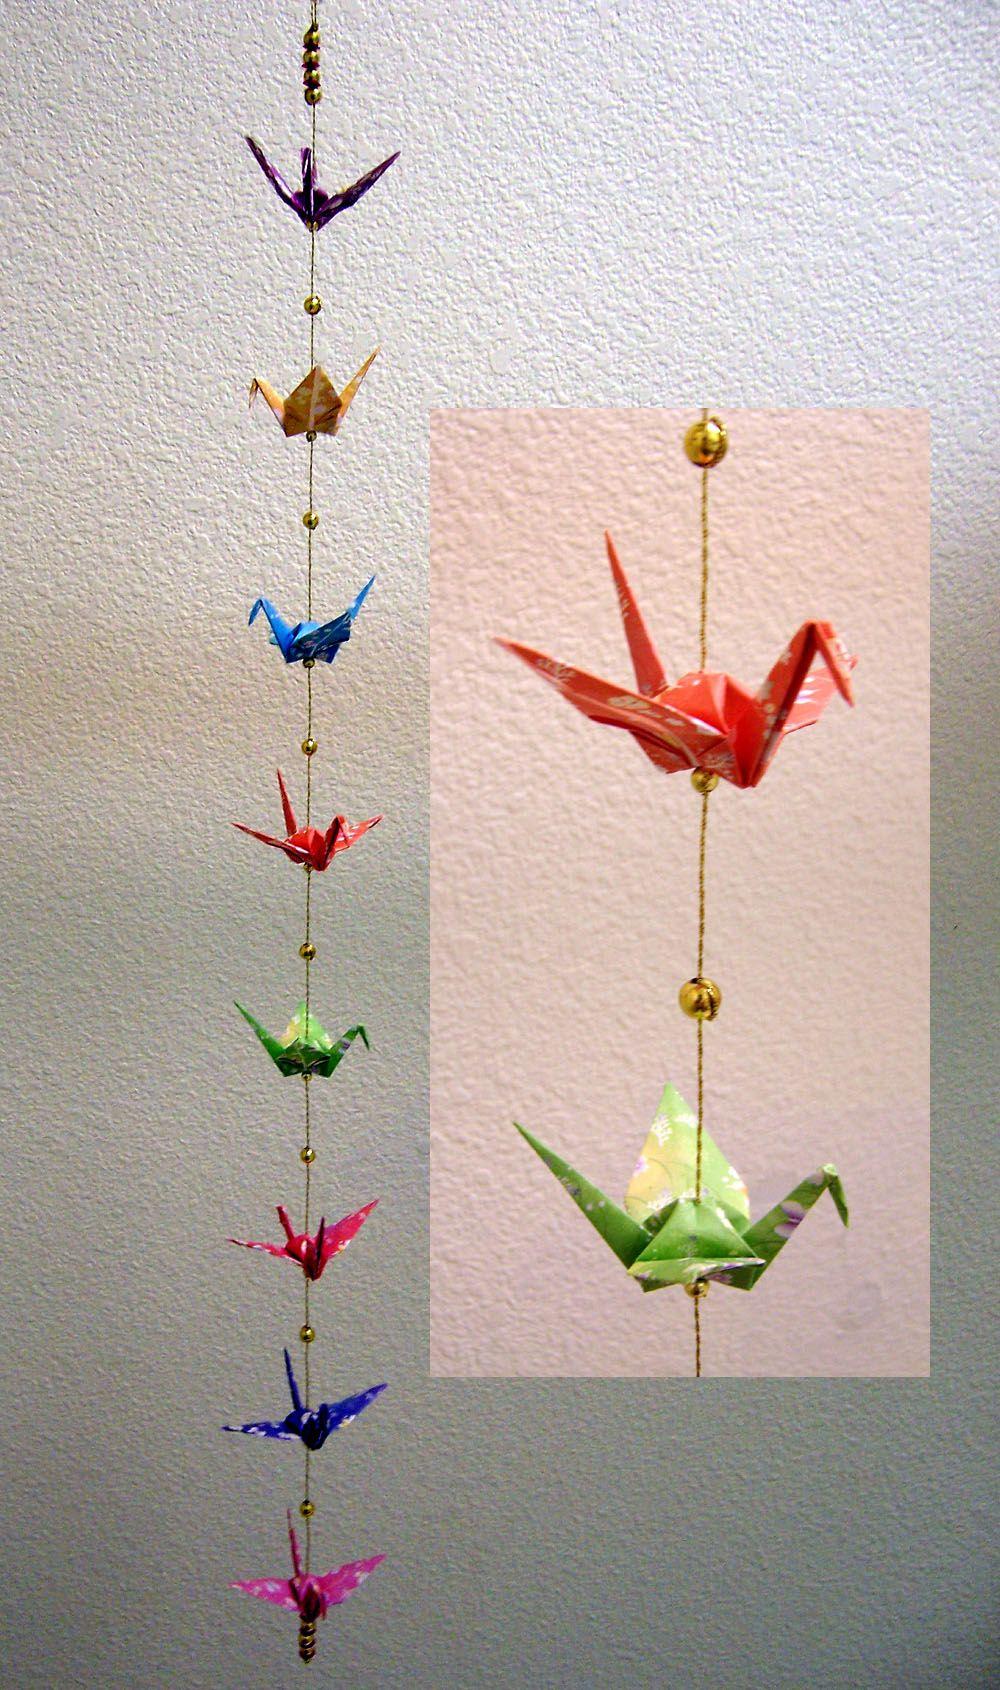 Origami crane crane origami craft ideas - Hanging Origami Cranes With Beads Google Search